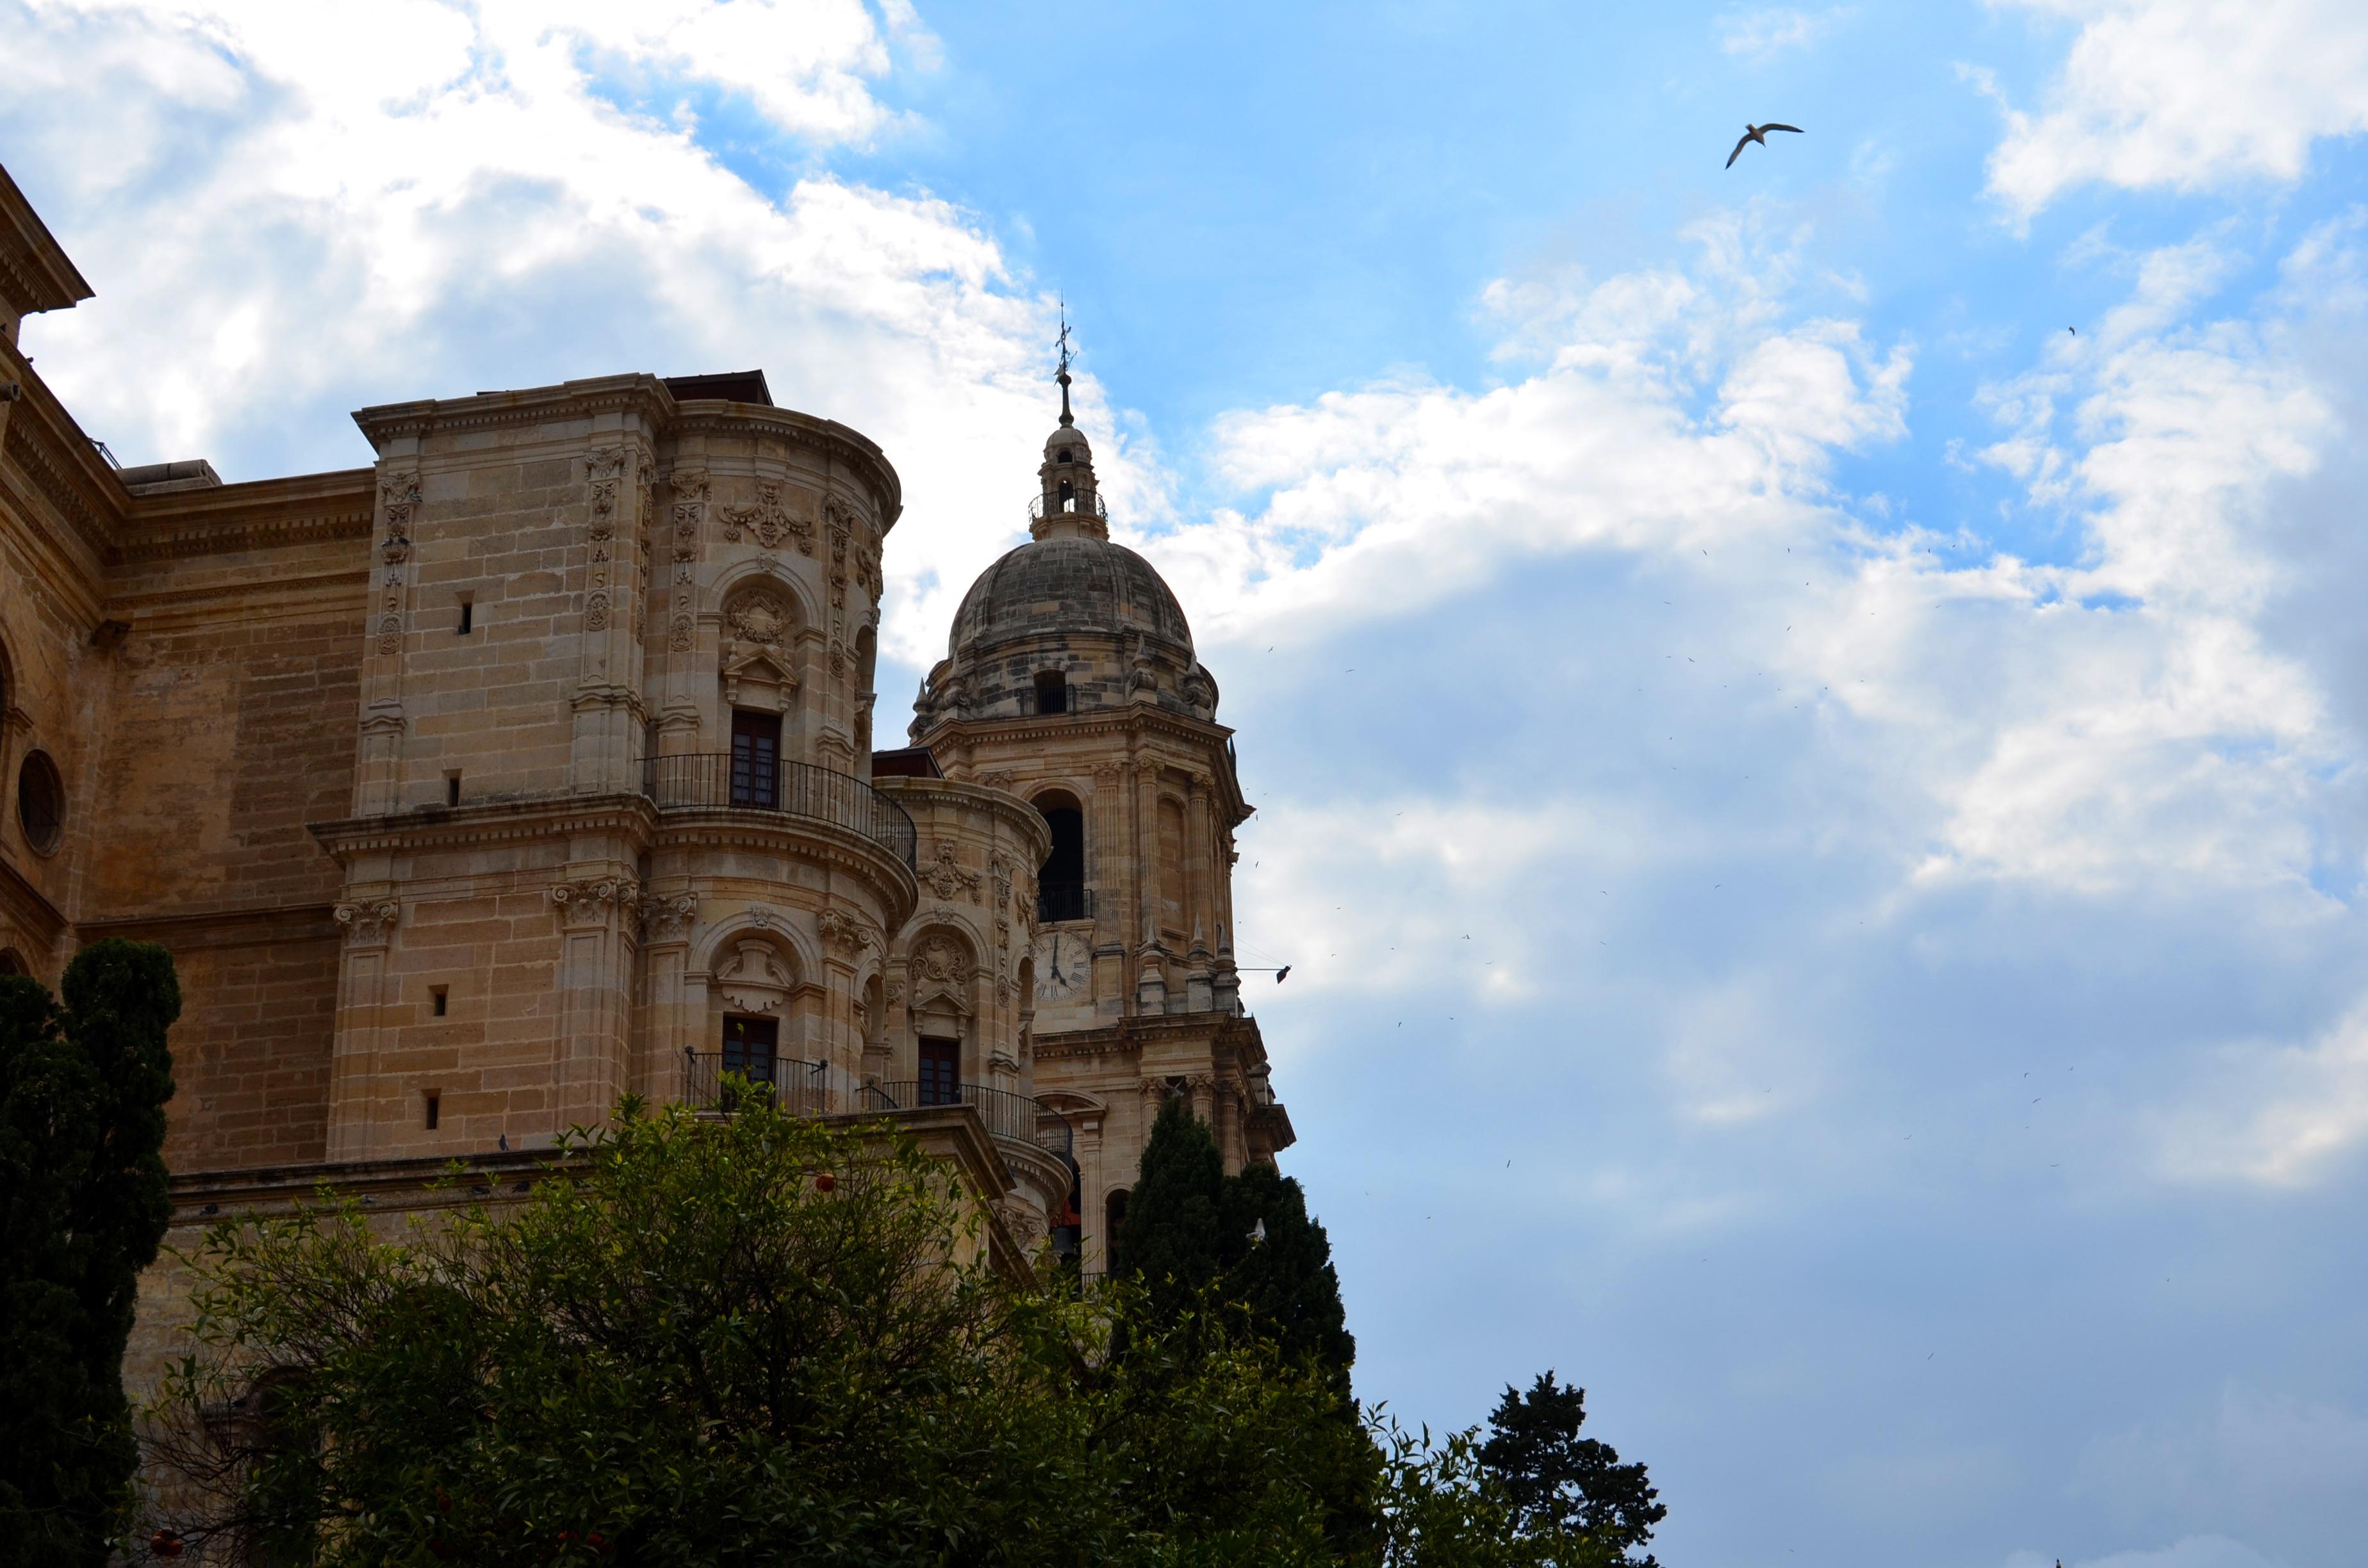 Proctor en Segovia visits the Cathedral of Málaga